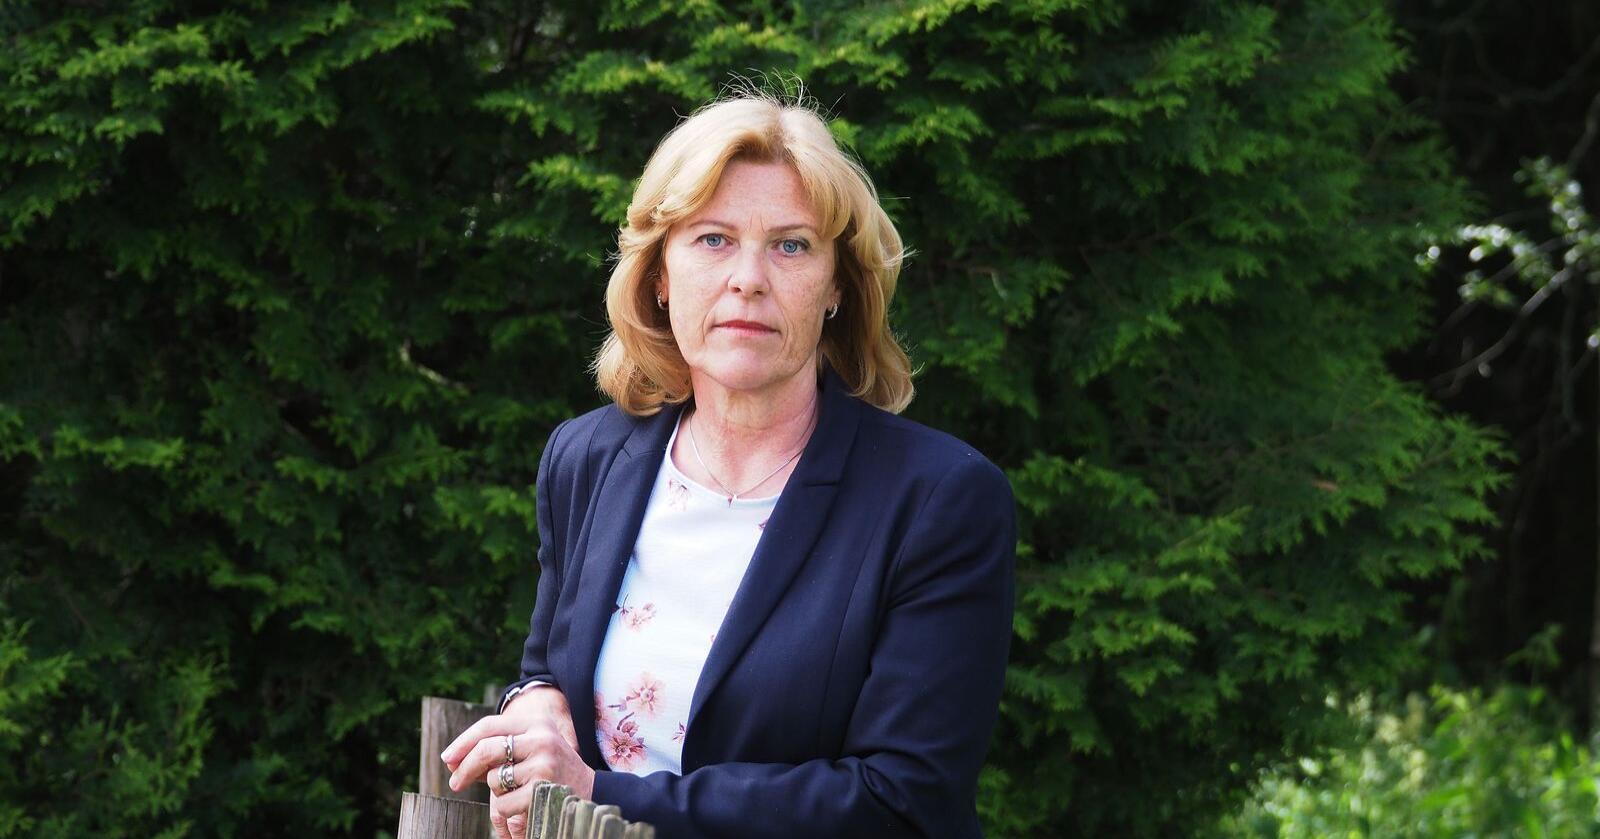 Konsernsjef i Nortura SA Anne Marit Panengstuen. Foto: Siri Juell Rasmussen